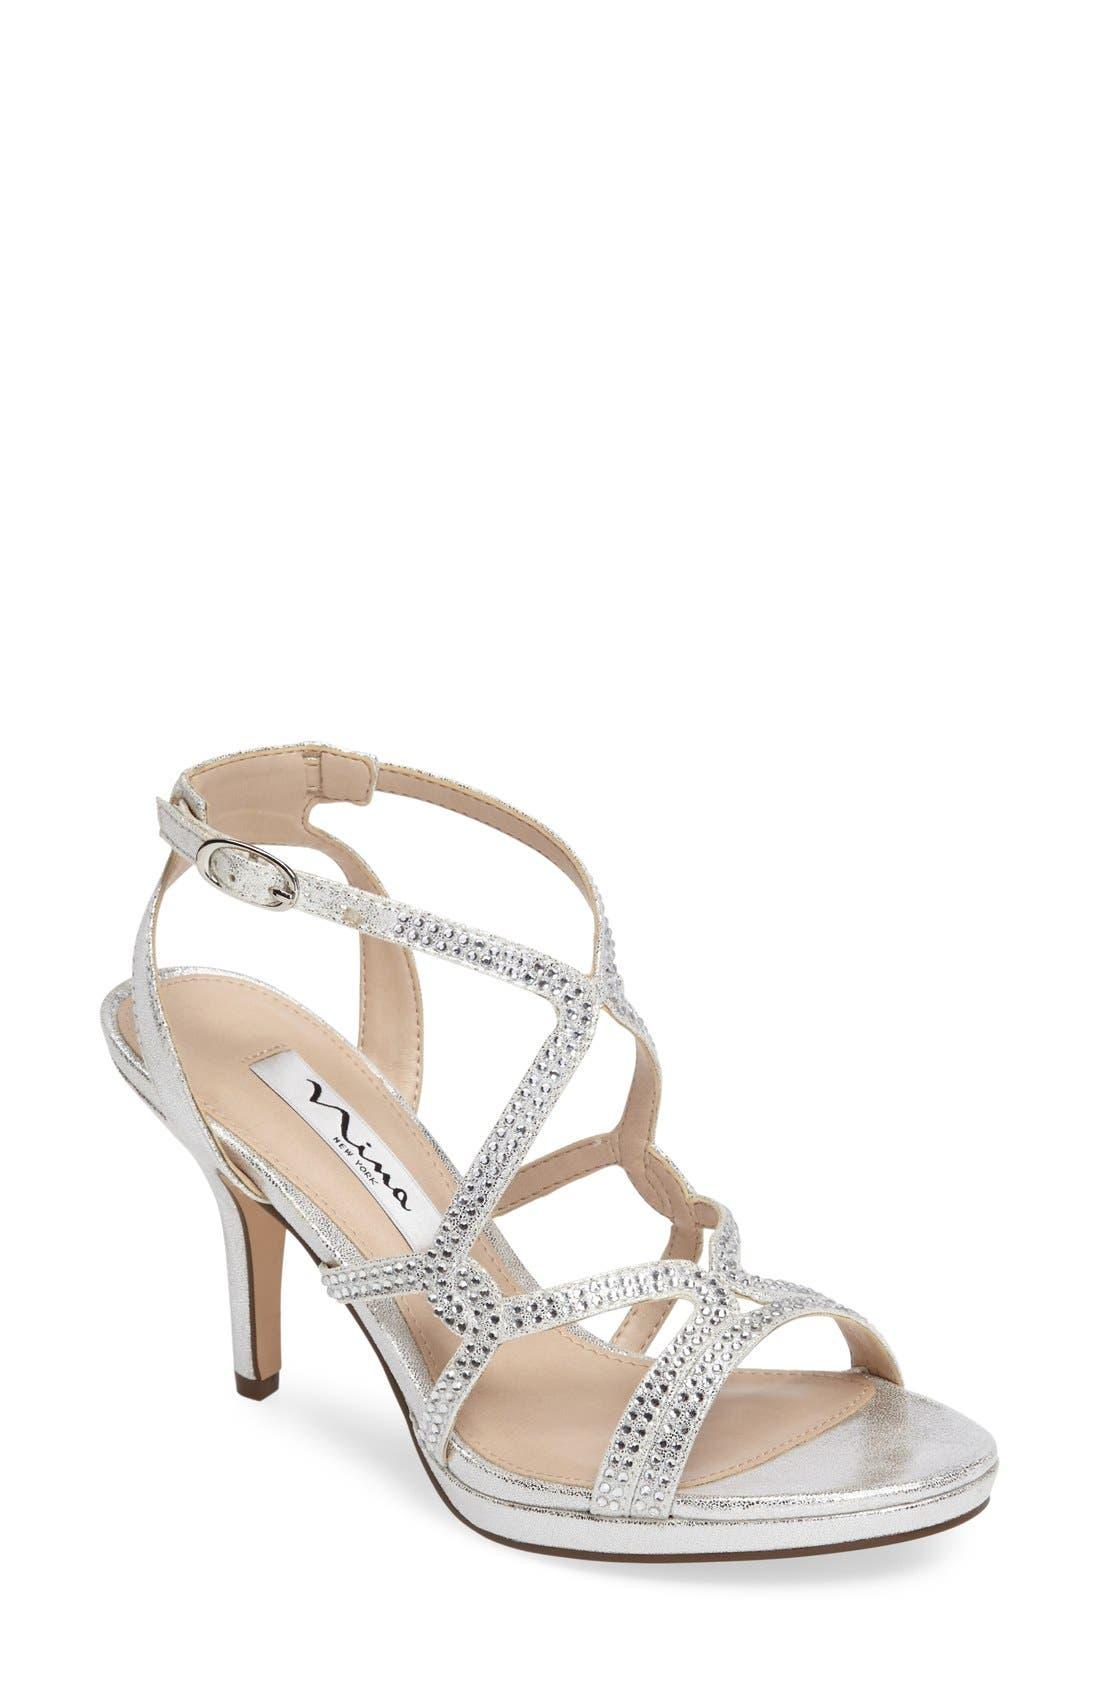 Varsha Crystal Embellished Evening Sandal,                             Main thumbnail 1, color,                             SILVER FAUX SUEDE